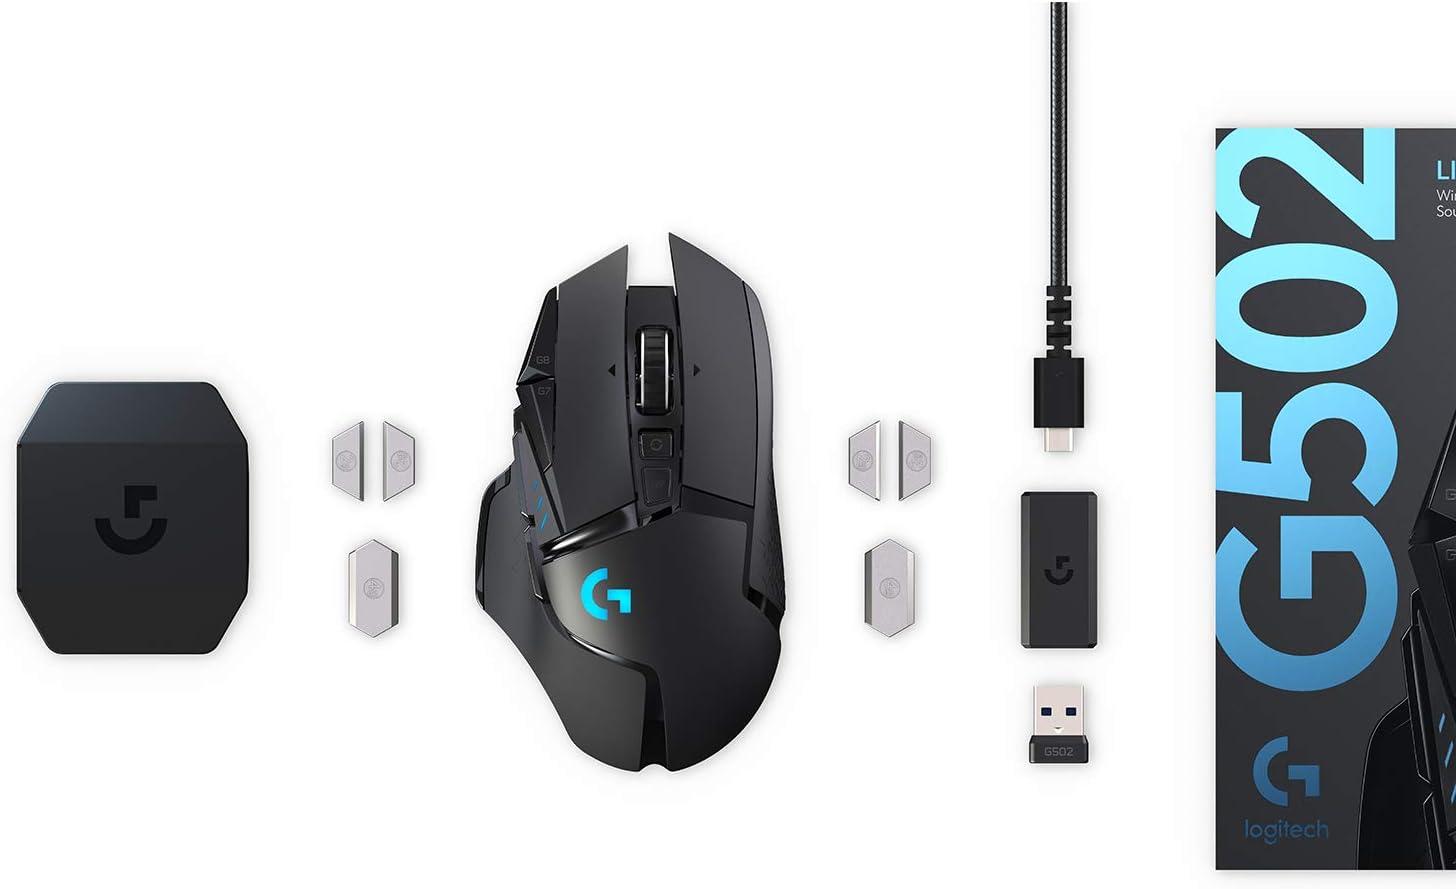 Logitech G502 Hero High-Performance Gaming Maus G213 Prodigy Gaming-Tastatur RGB-Beleuchtung Hero 16000 DPI Optischer Sensor